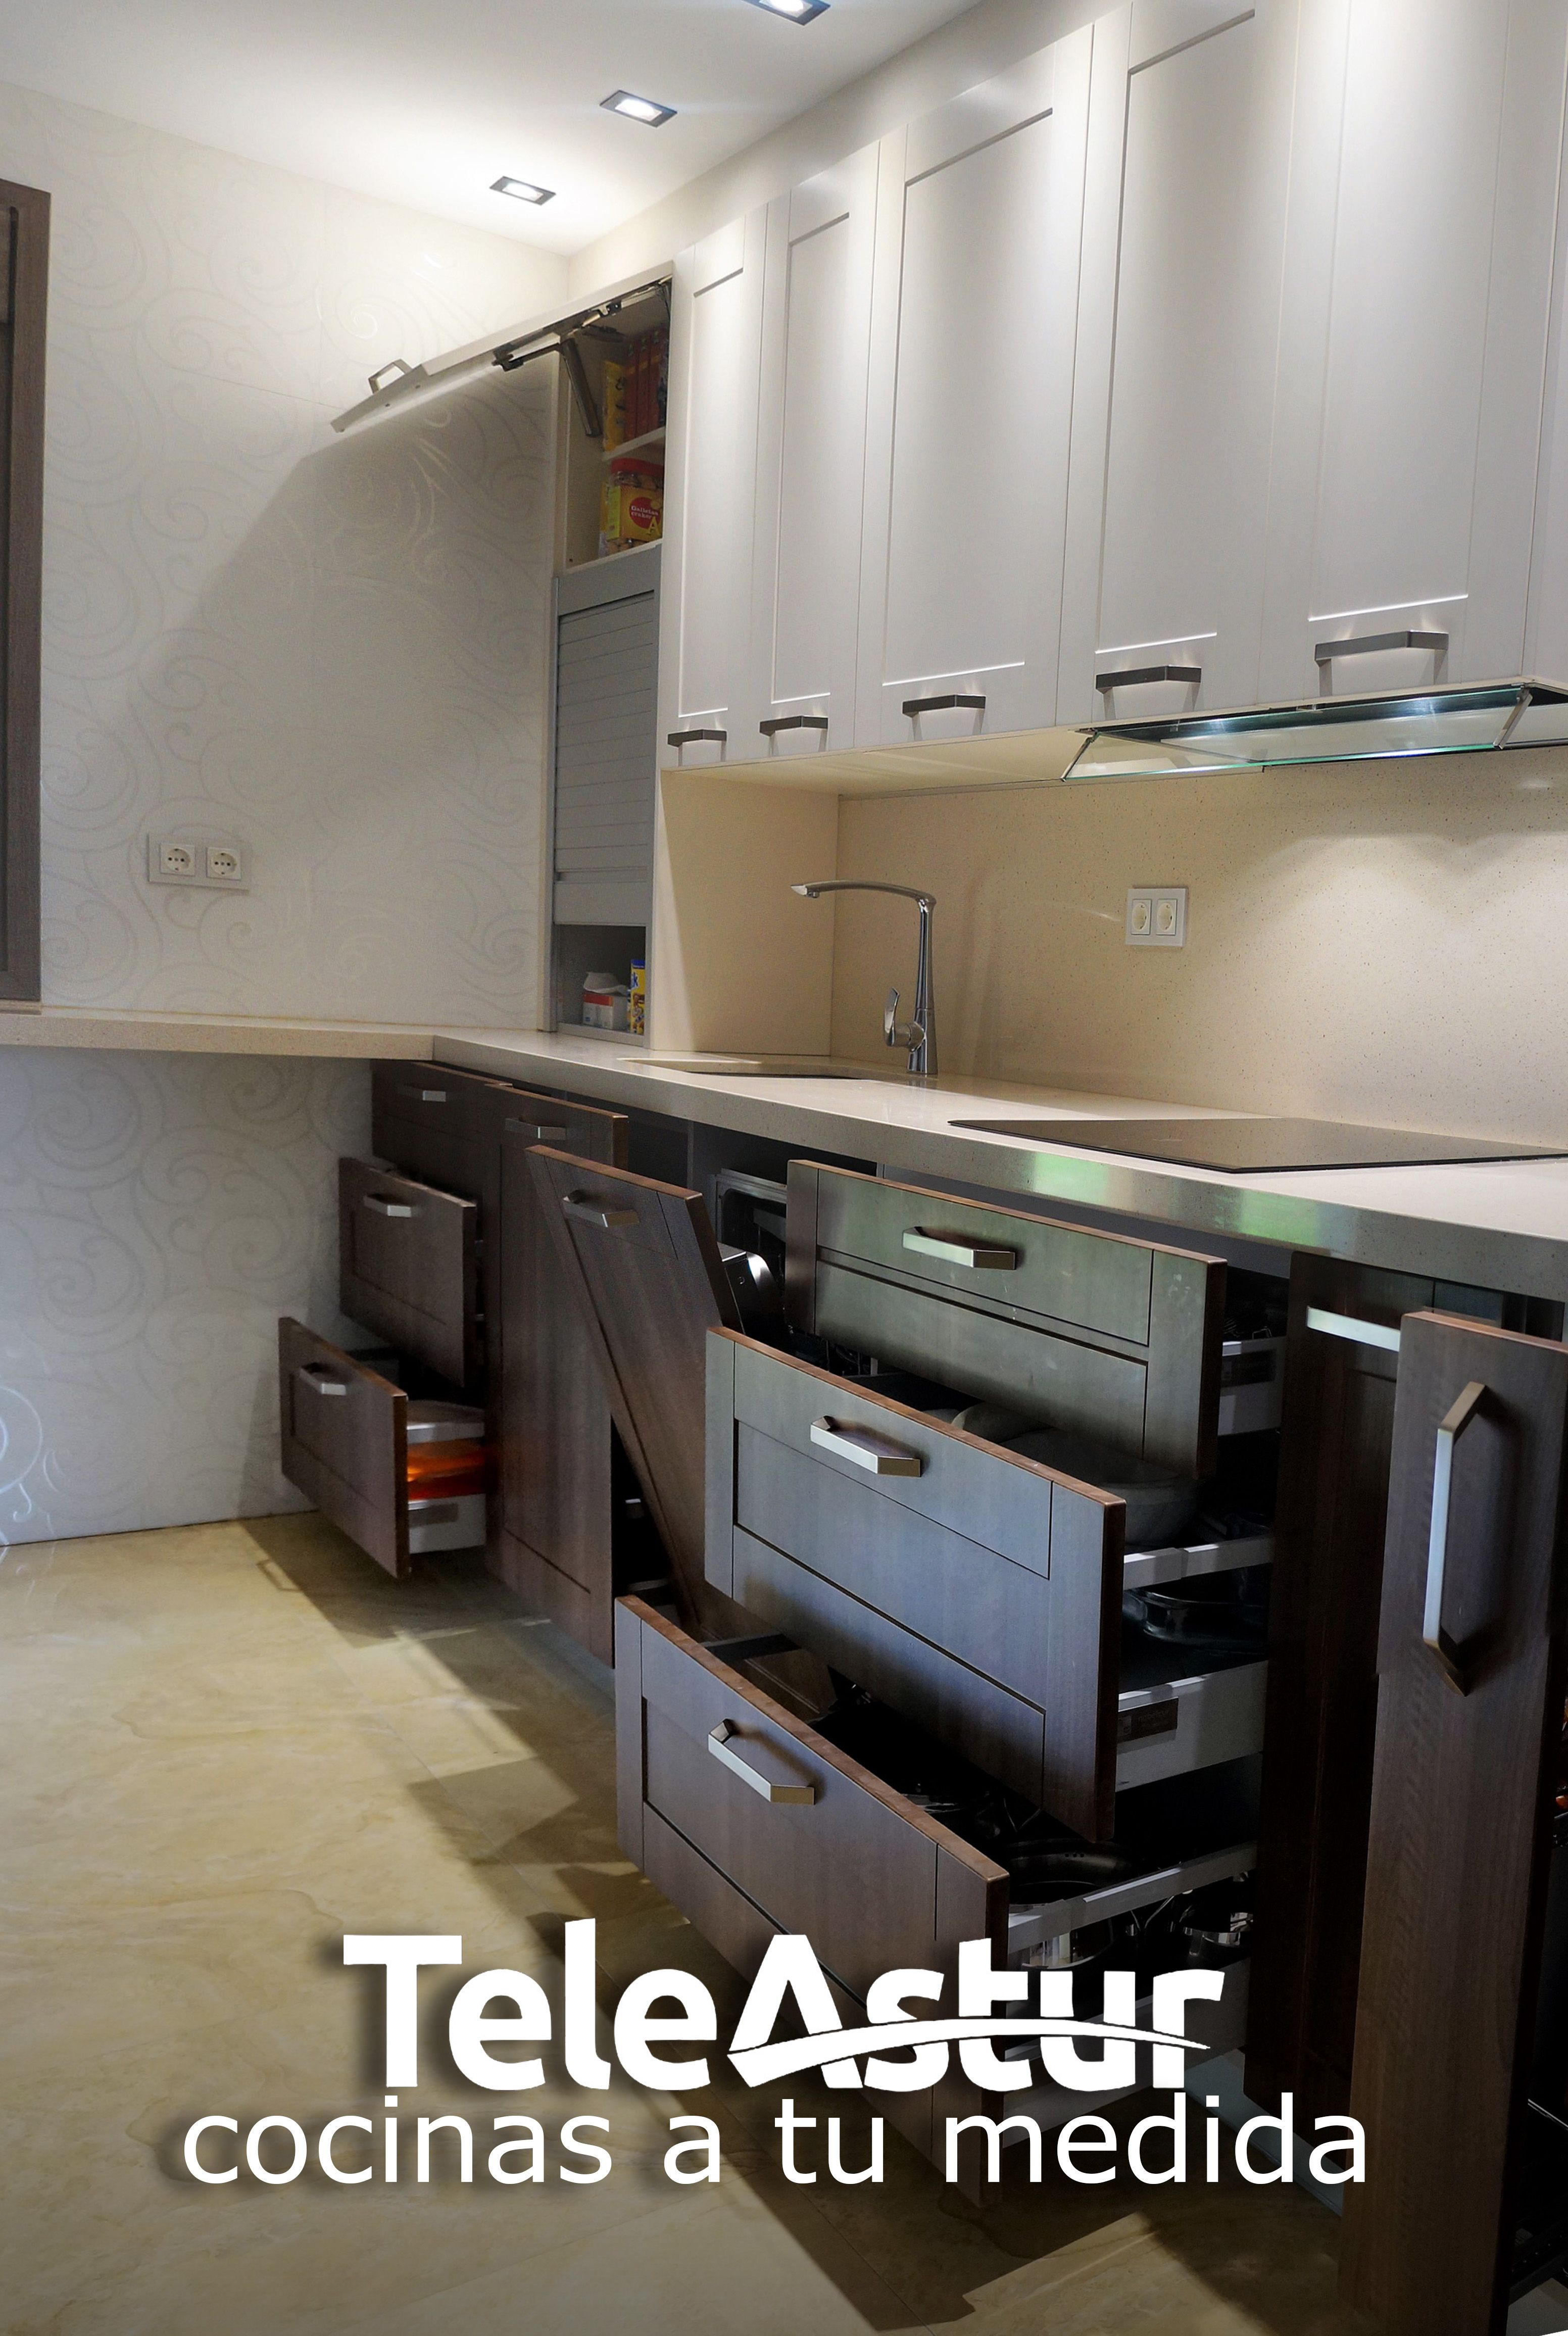 campana integrada | Teleastur Cocinas | Pinterest | Muebles de ...